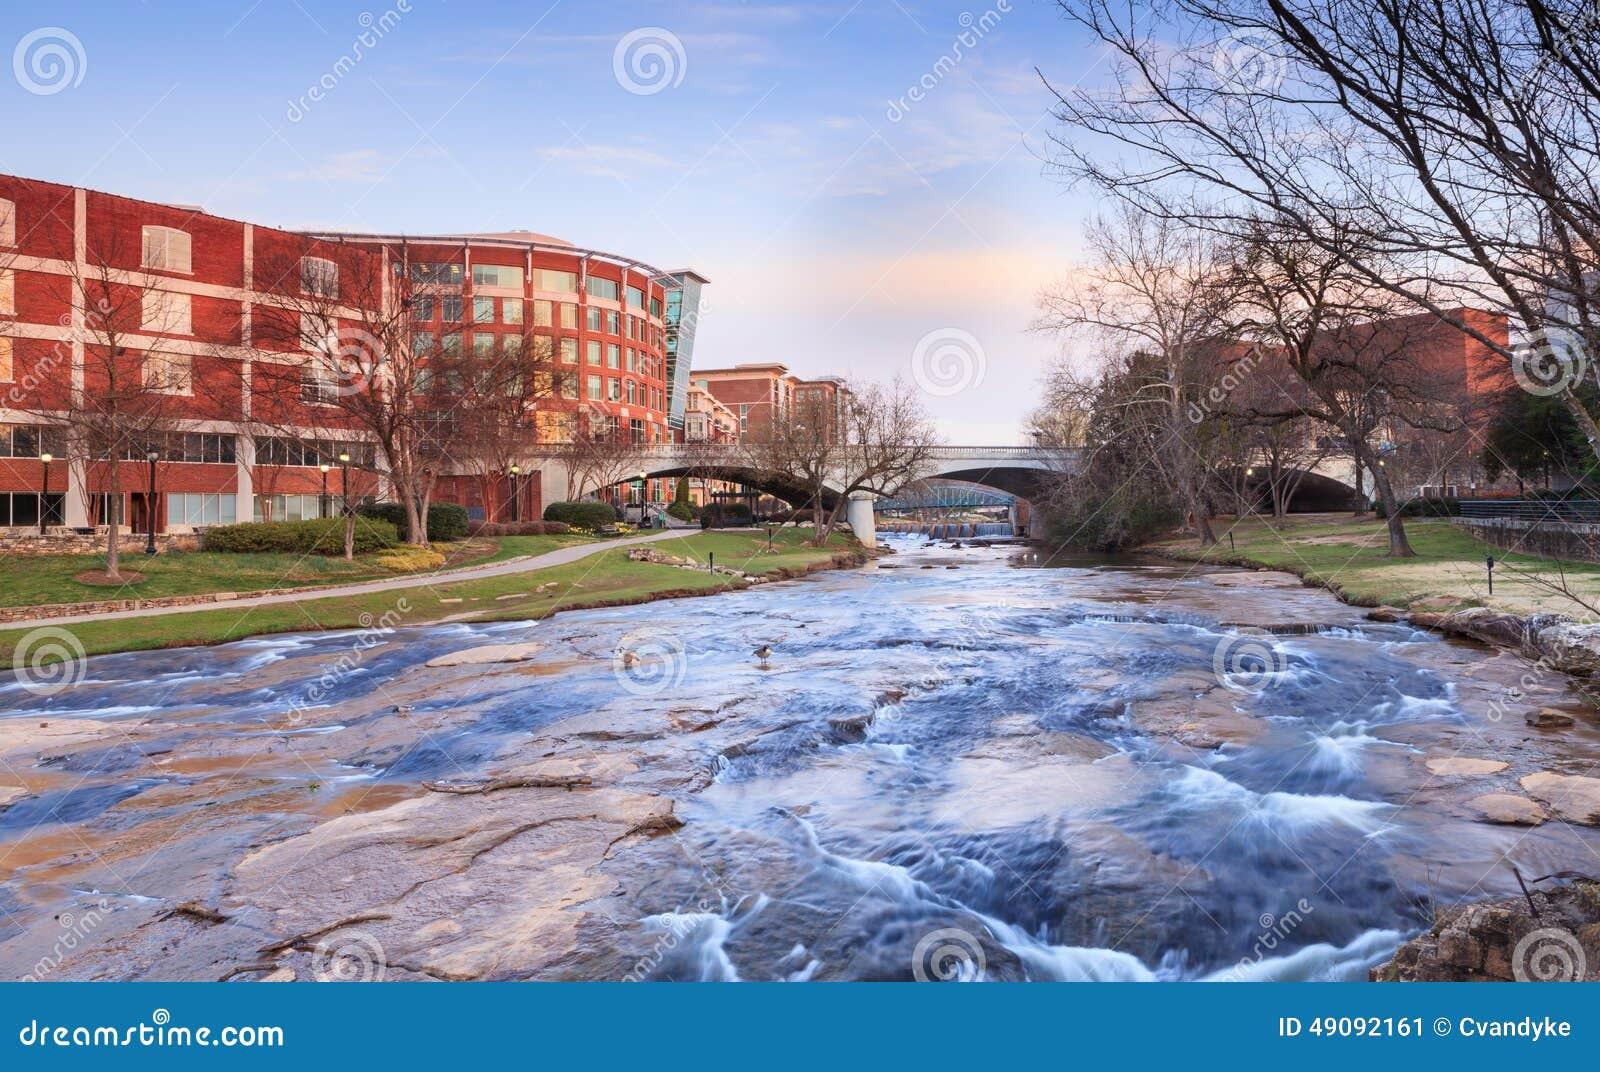 Reedy River Greenville South Carolina